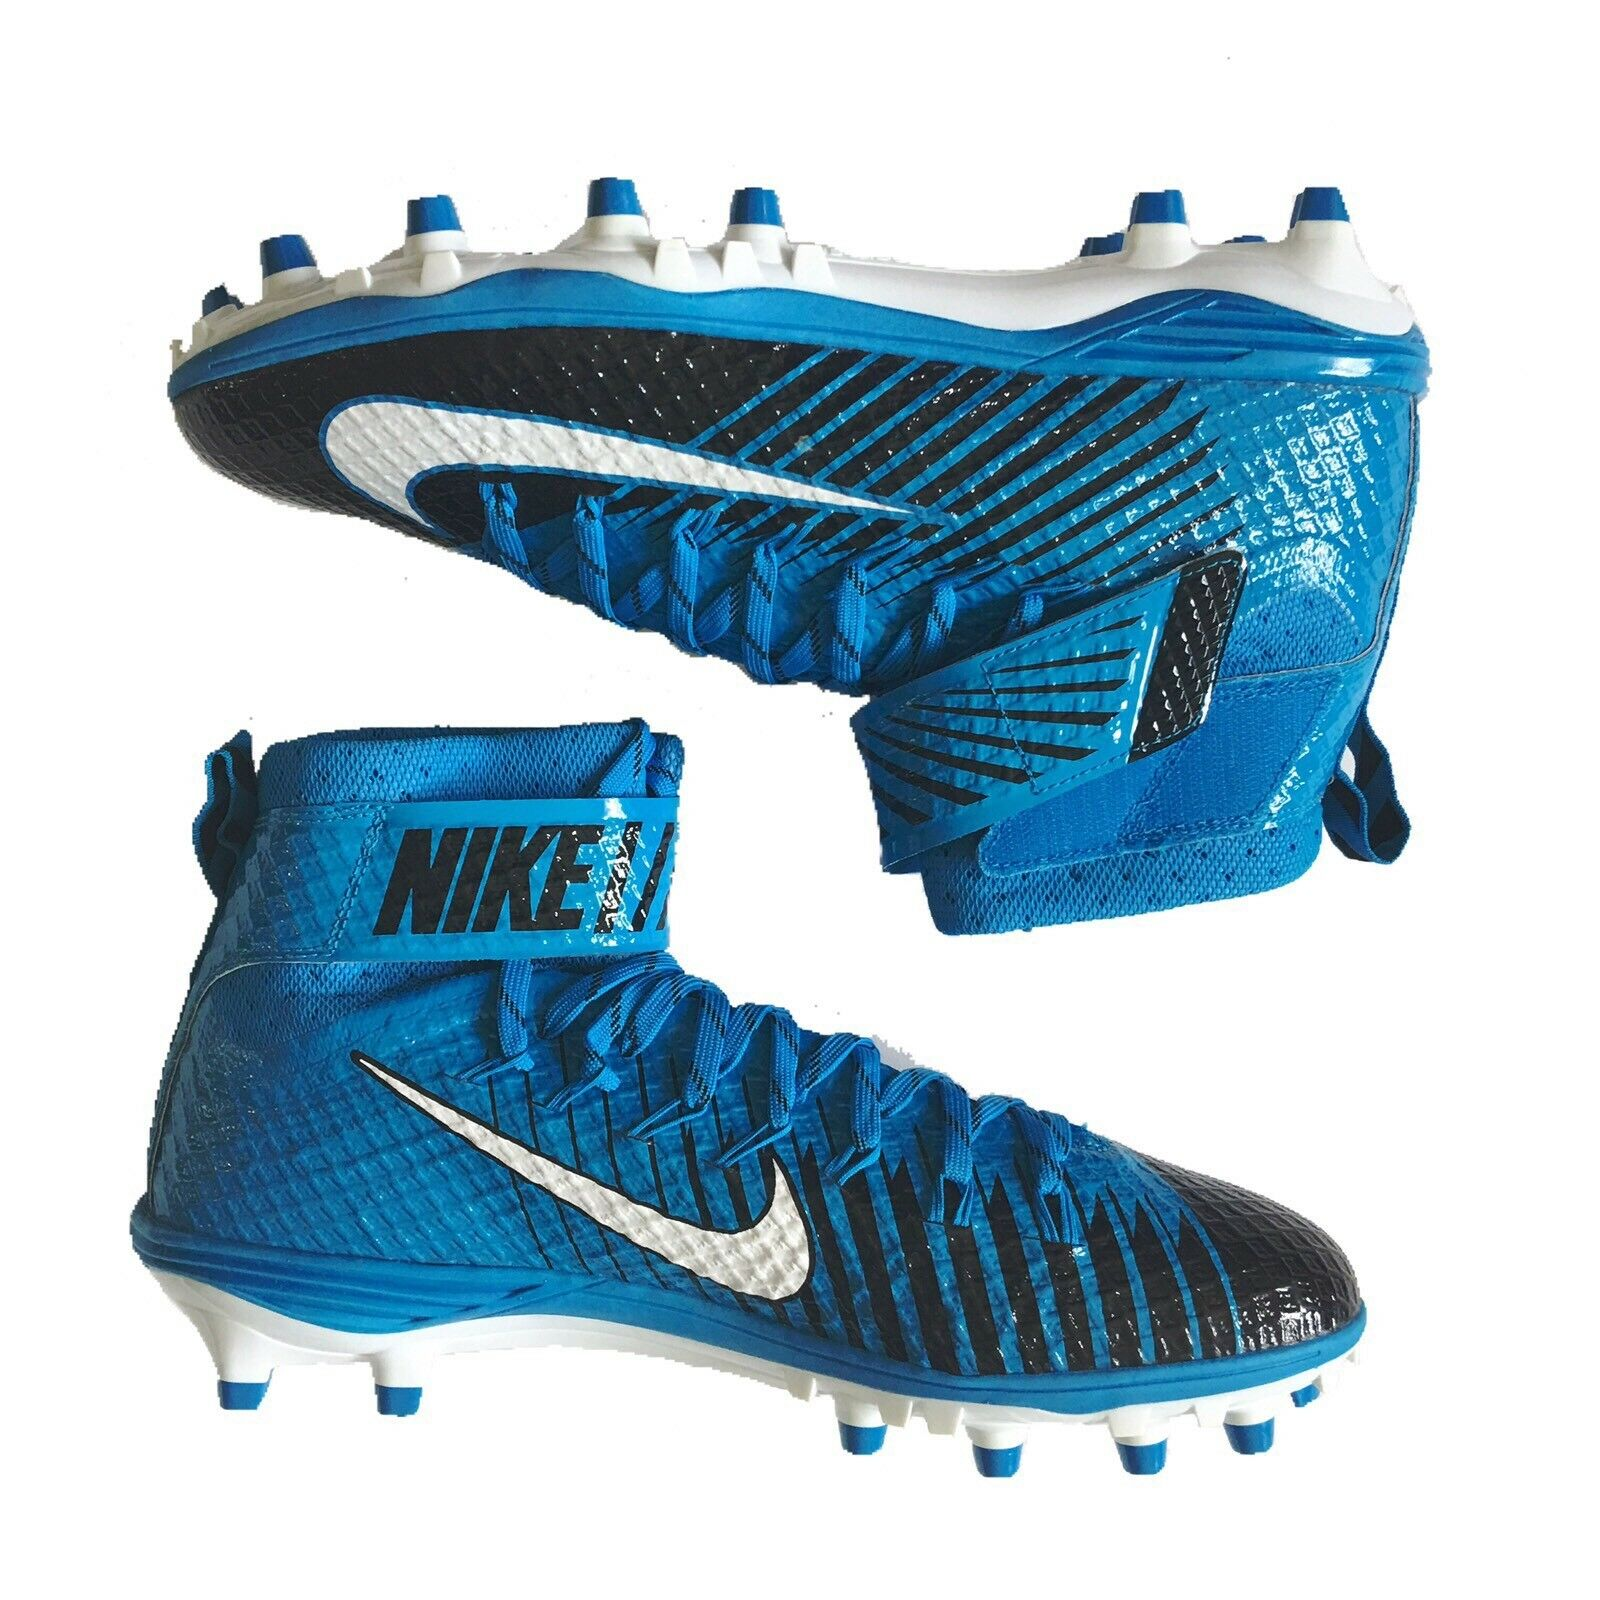 buy popular f9b7a 44ed4 ... netherlands nike lunarbeast elite td de los zapatos de tacos de td  futbol sz 11 azul